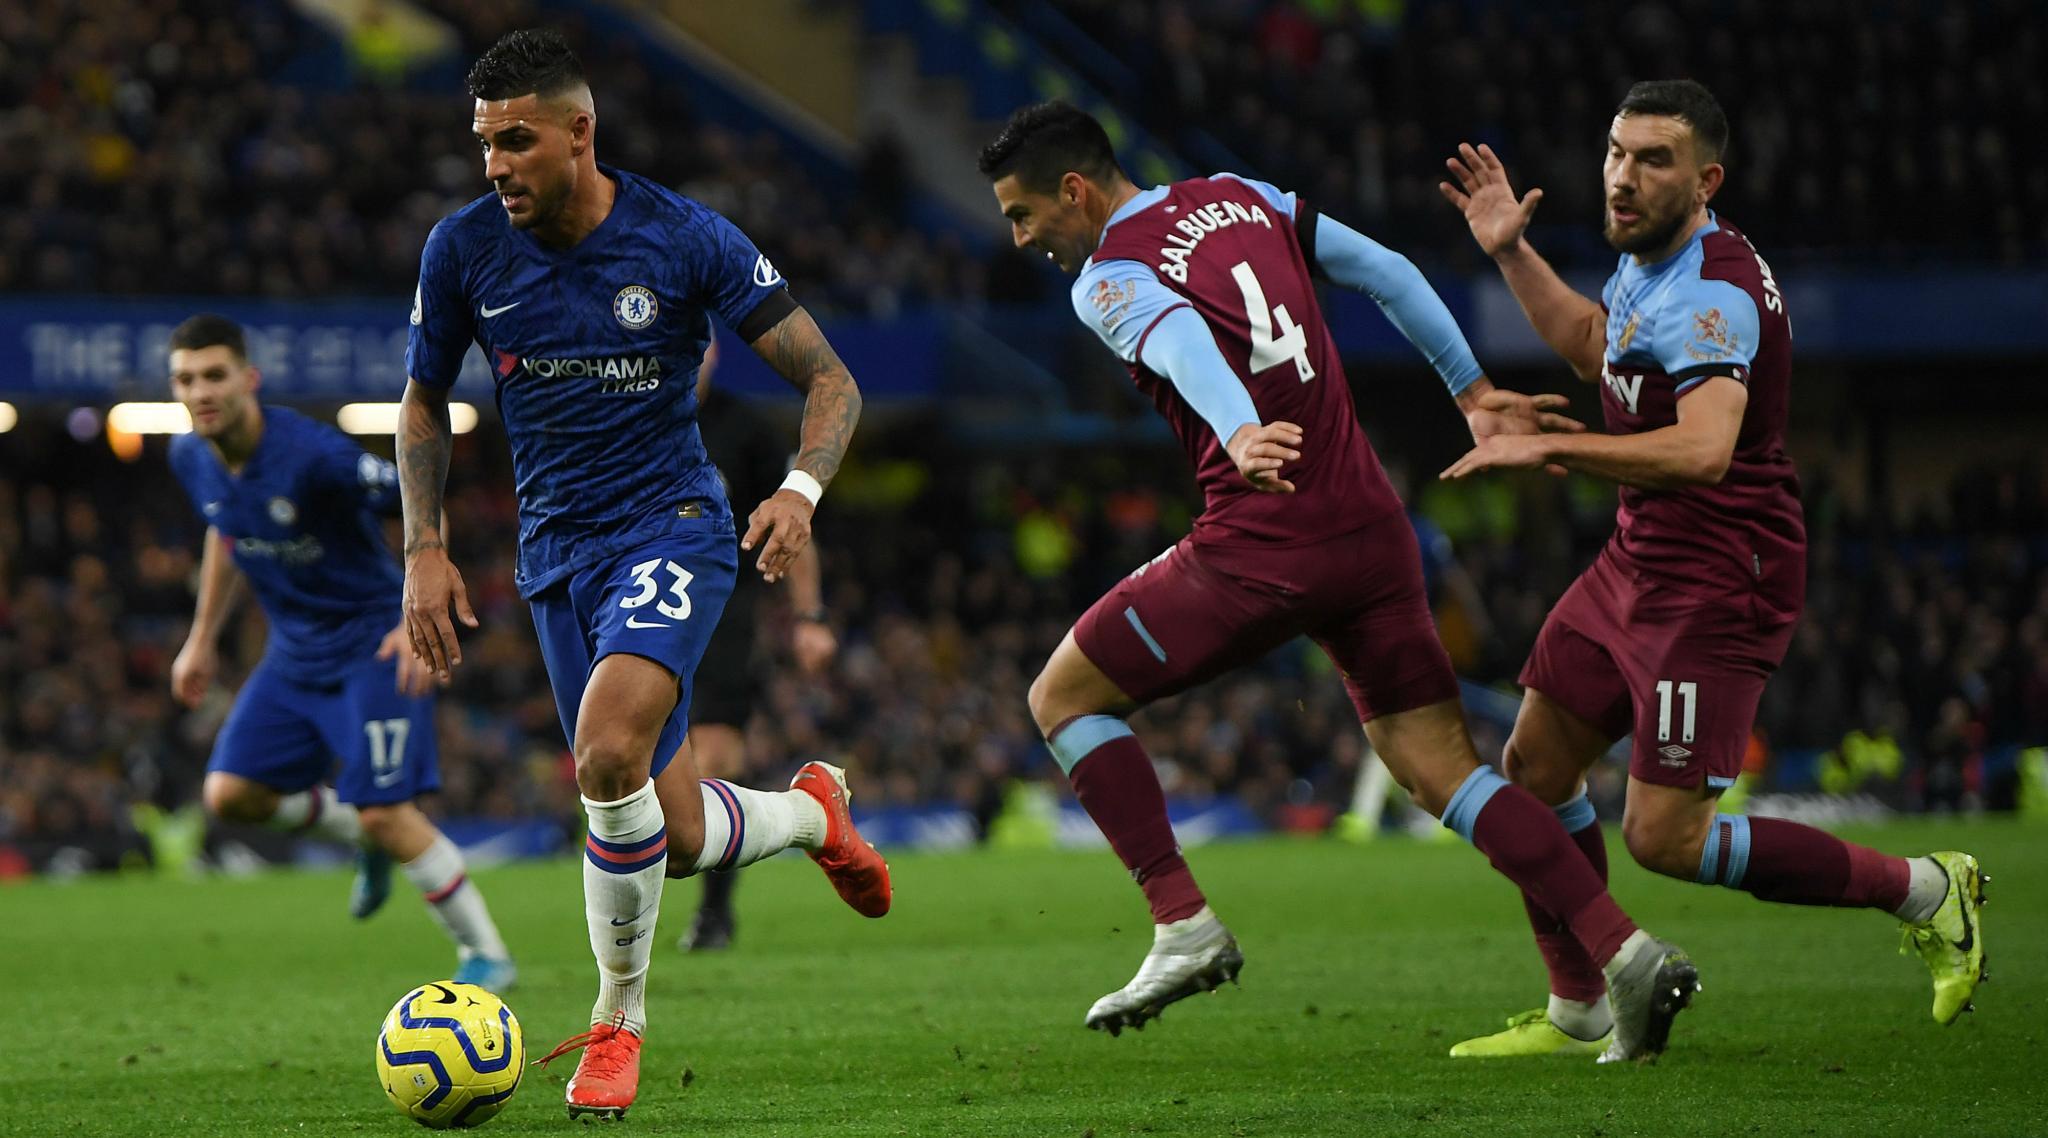 Chelsea 0-1 West Ham, Premier League 2019-20 Result: Aaron Cresswell Halts Hammers' 7-Match Winless Run With Shock Chelsea Win